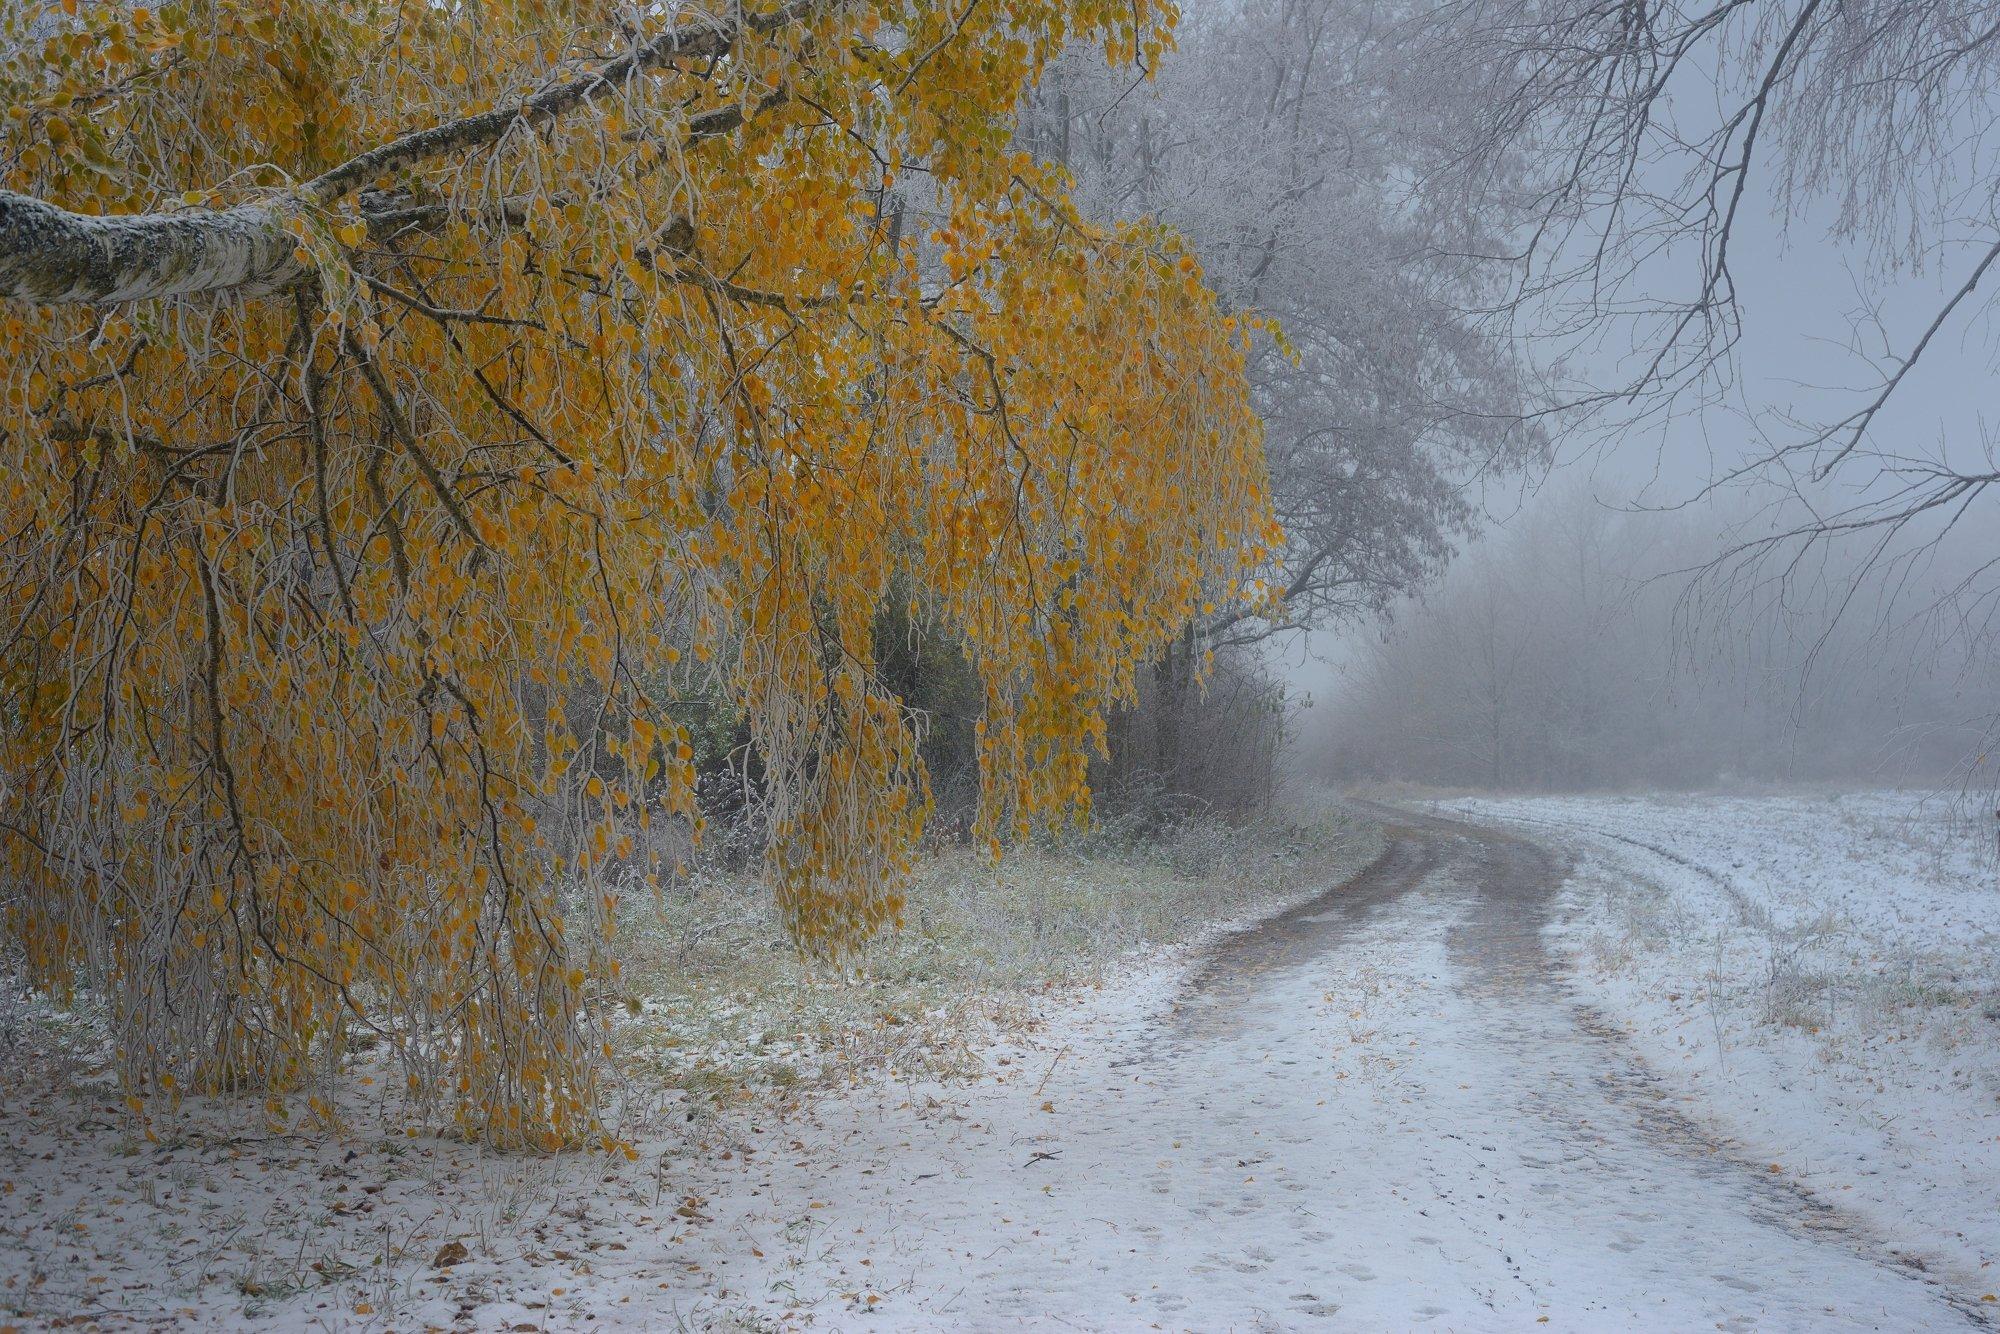 осень лес деревья листья туман, Александр Жарников